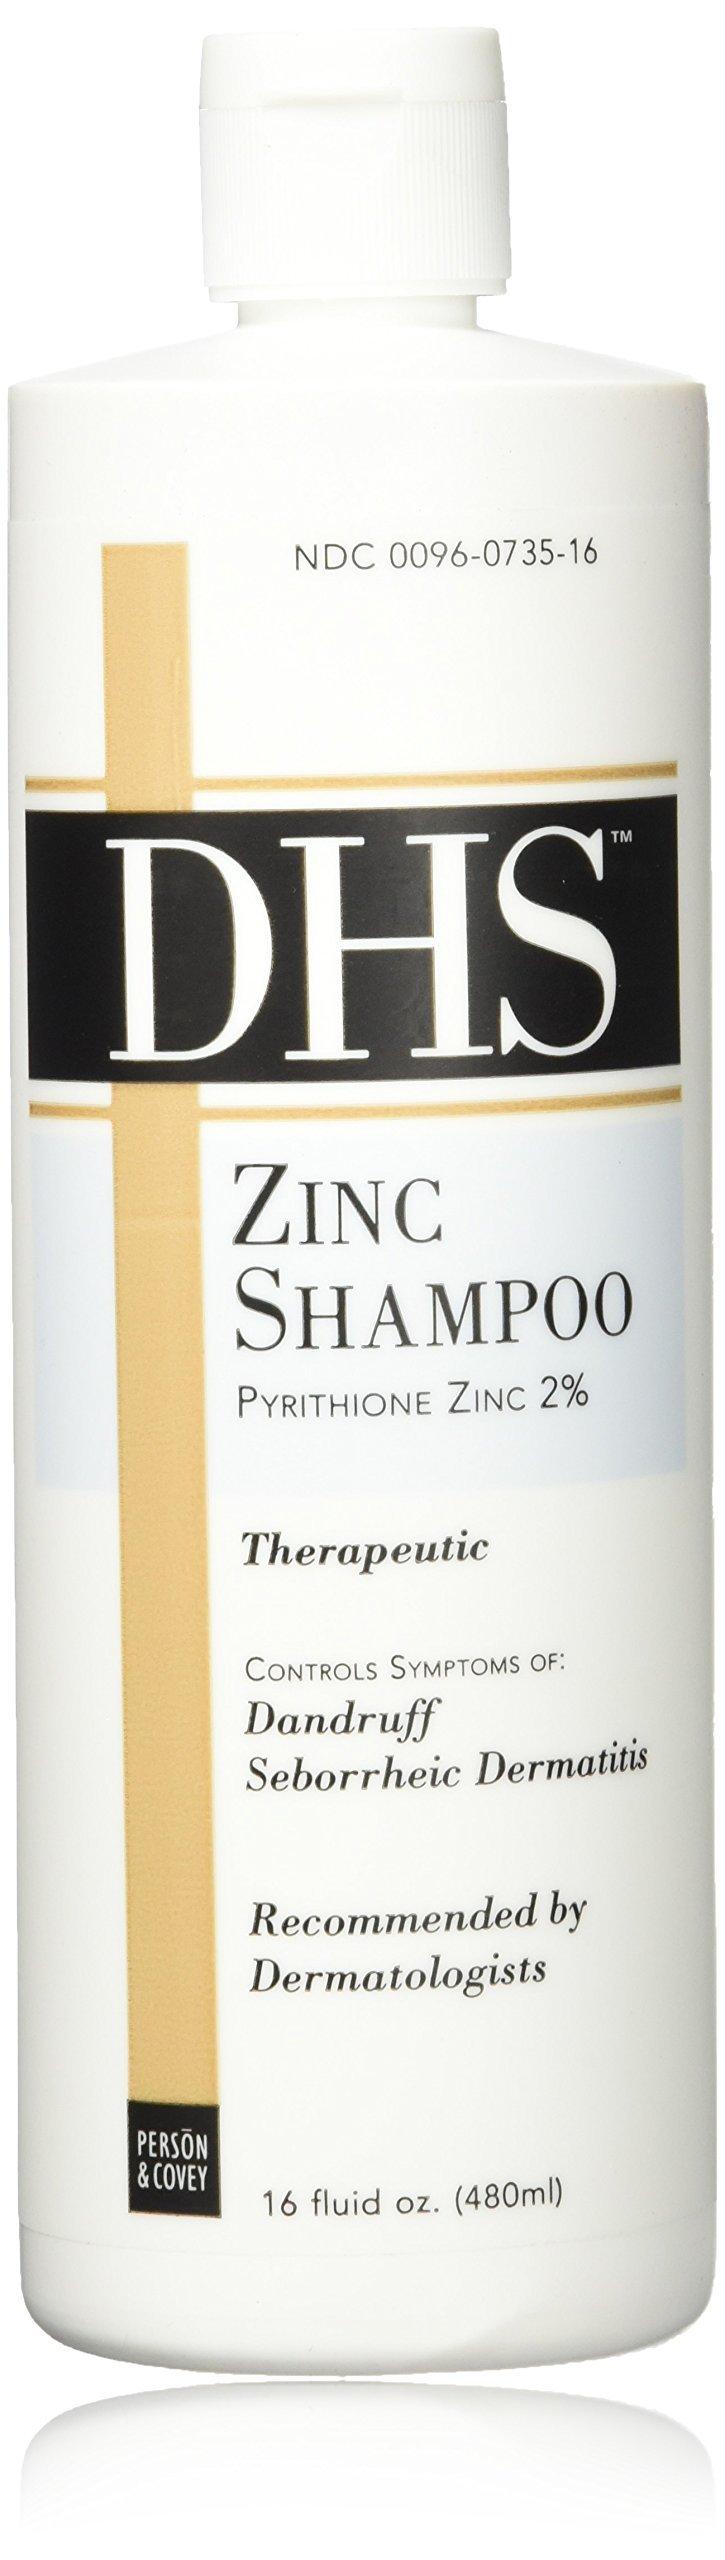 Zinc Shampoo, Dhs 16oz by DHS